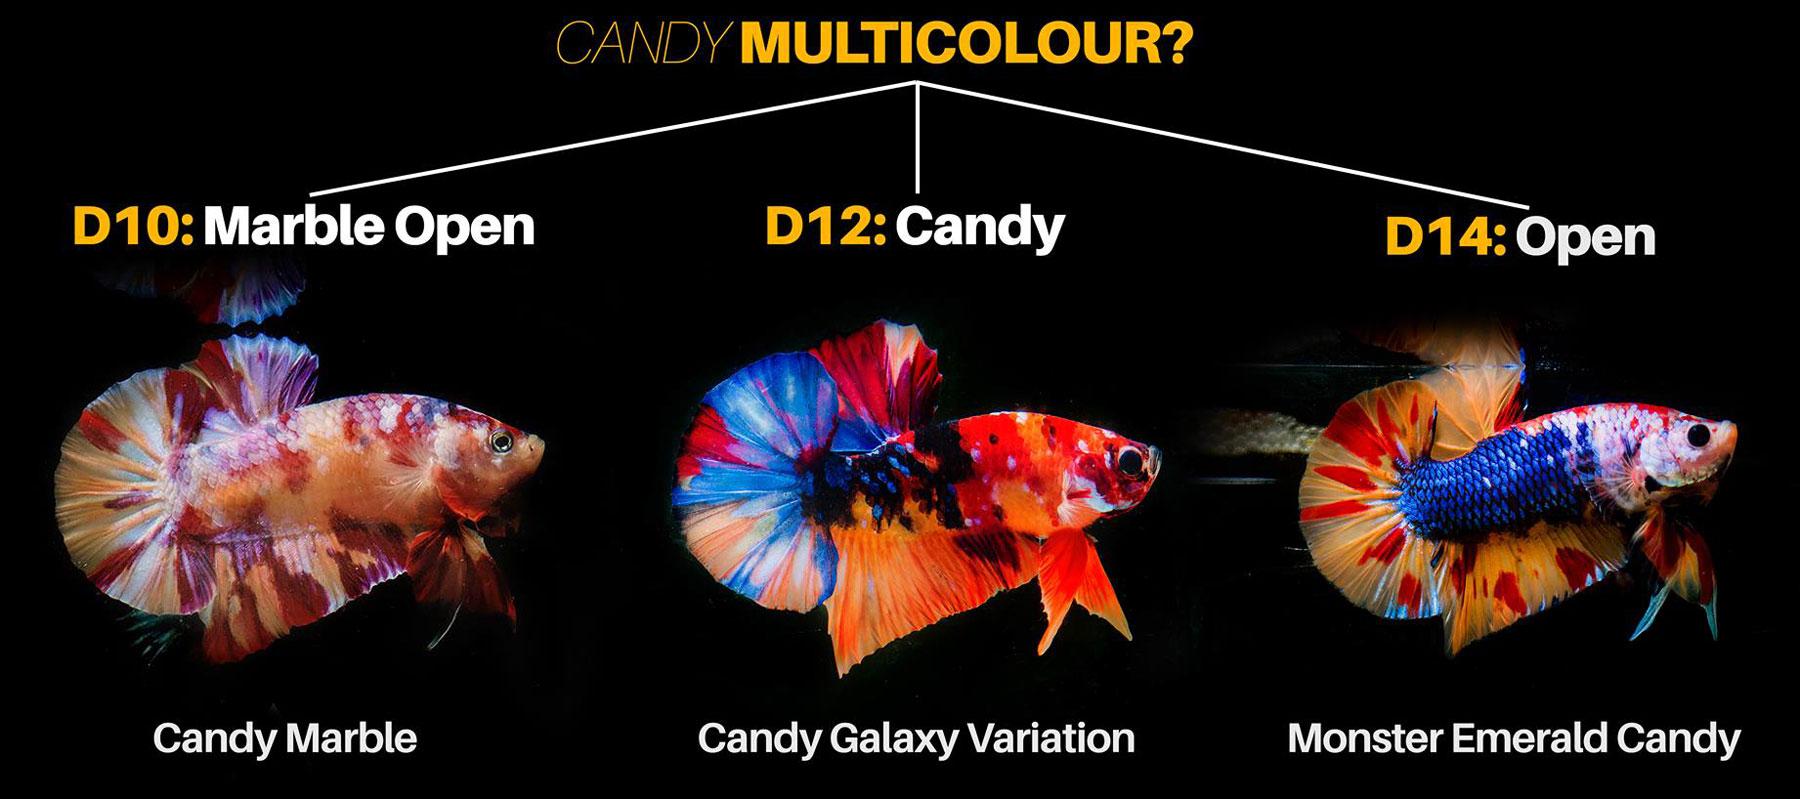 Cá betta thuộc dòng Candy Multicolour